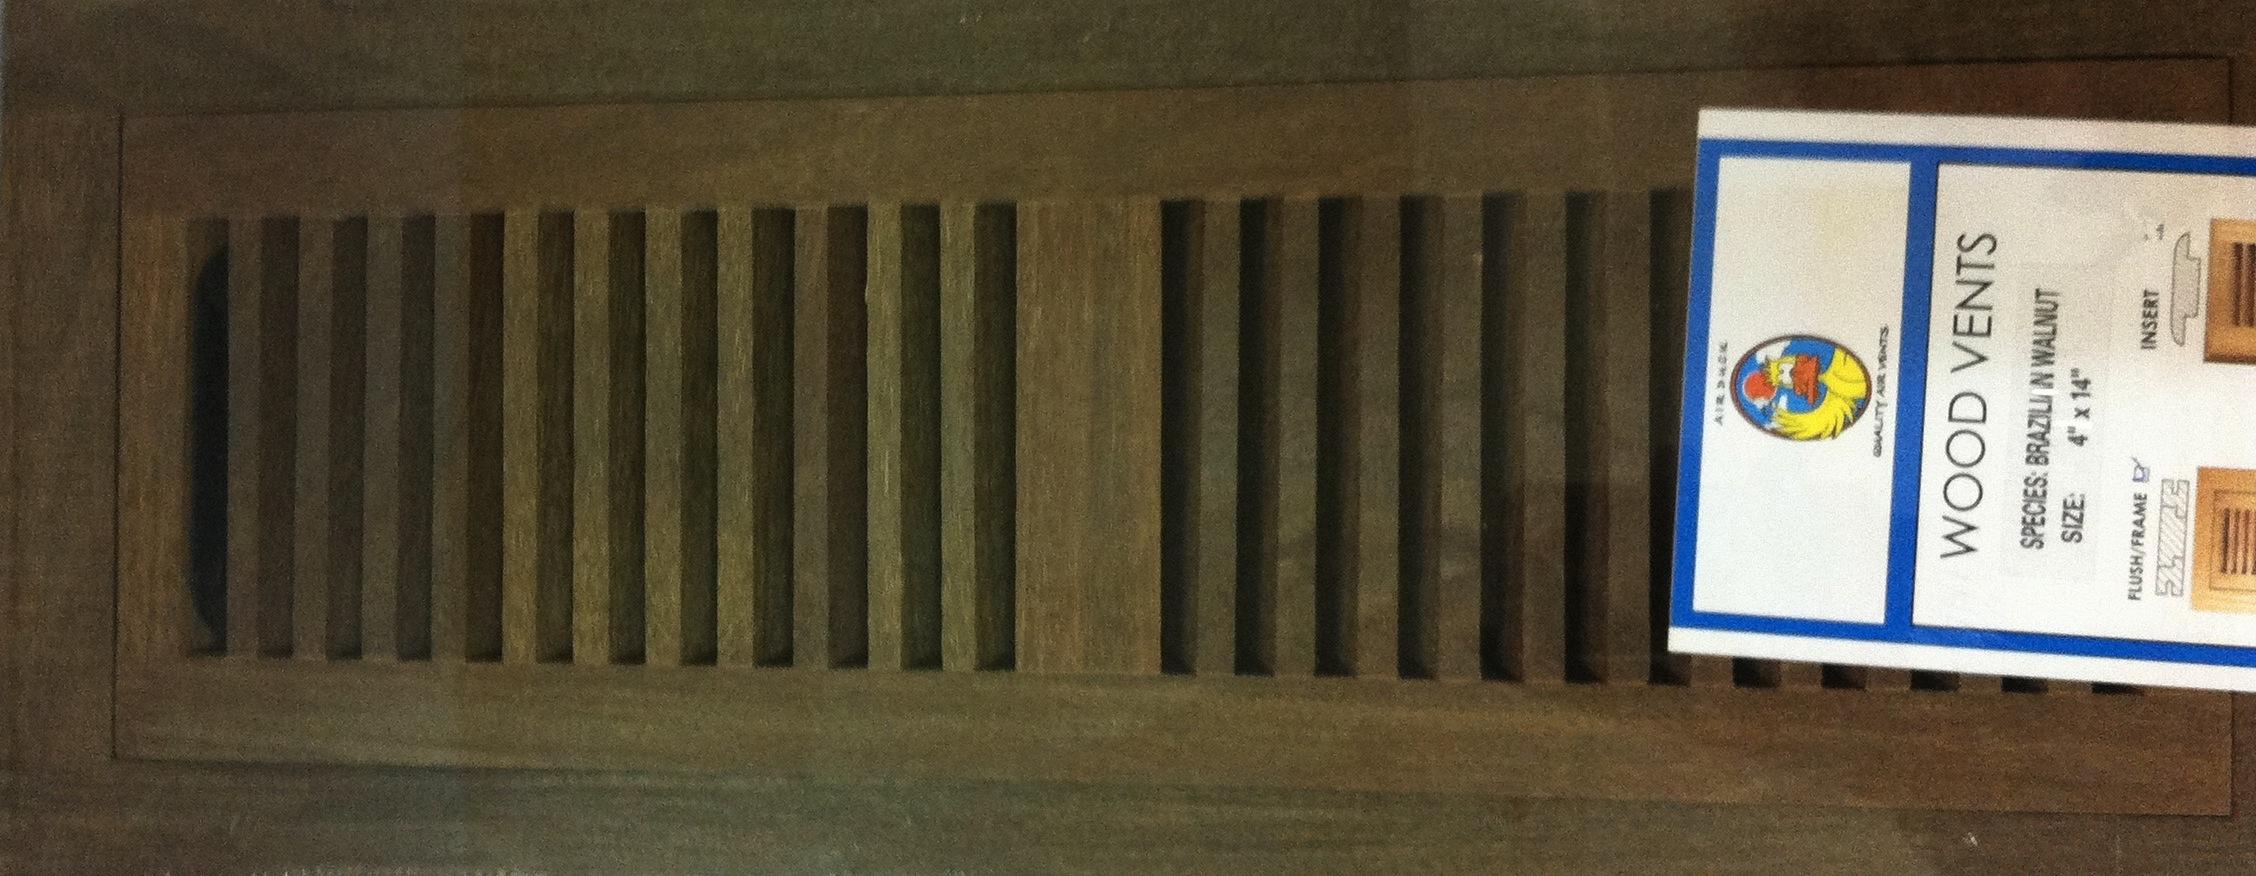 Brazilian Walnut Vent Covers Ipe Wood Vent Covers